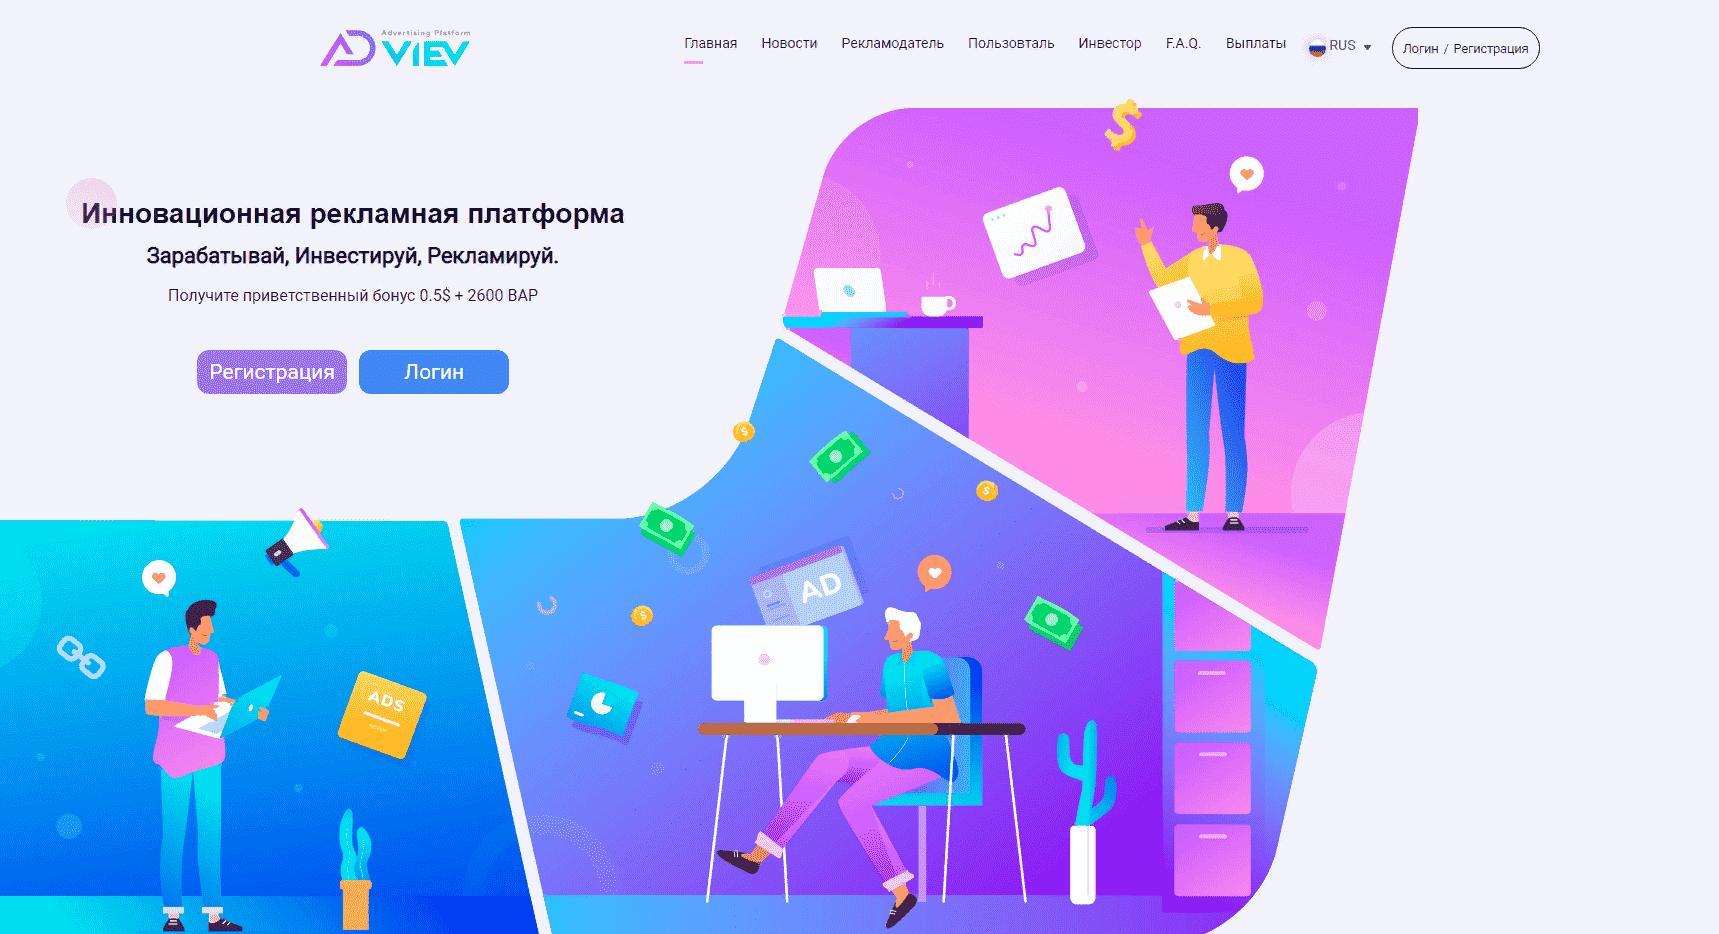 Adviev